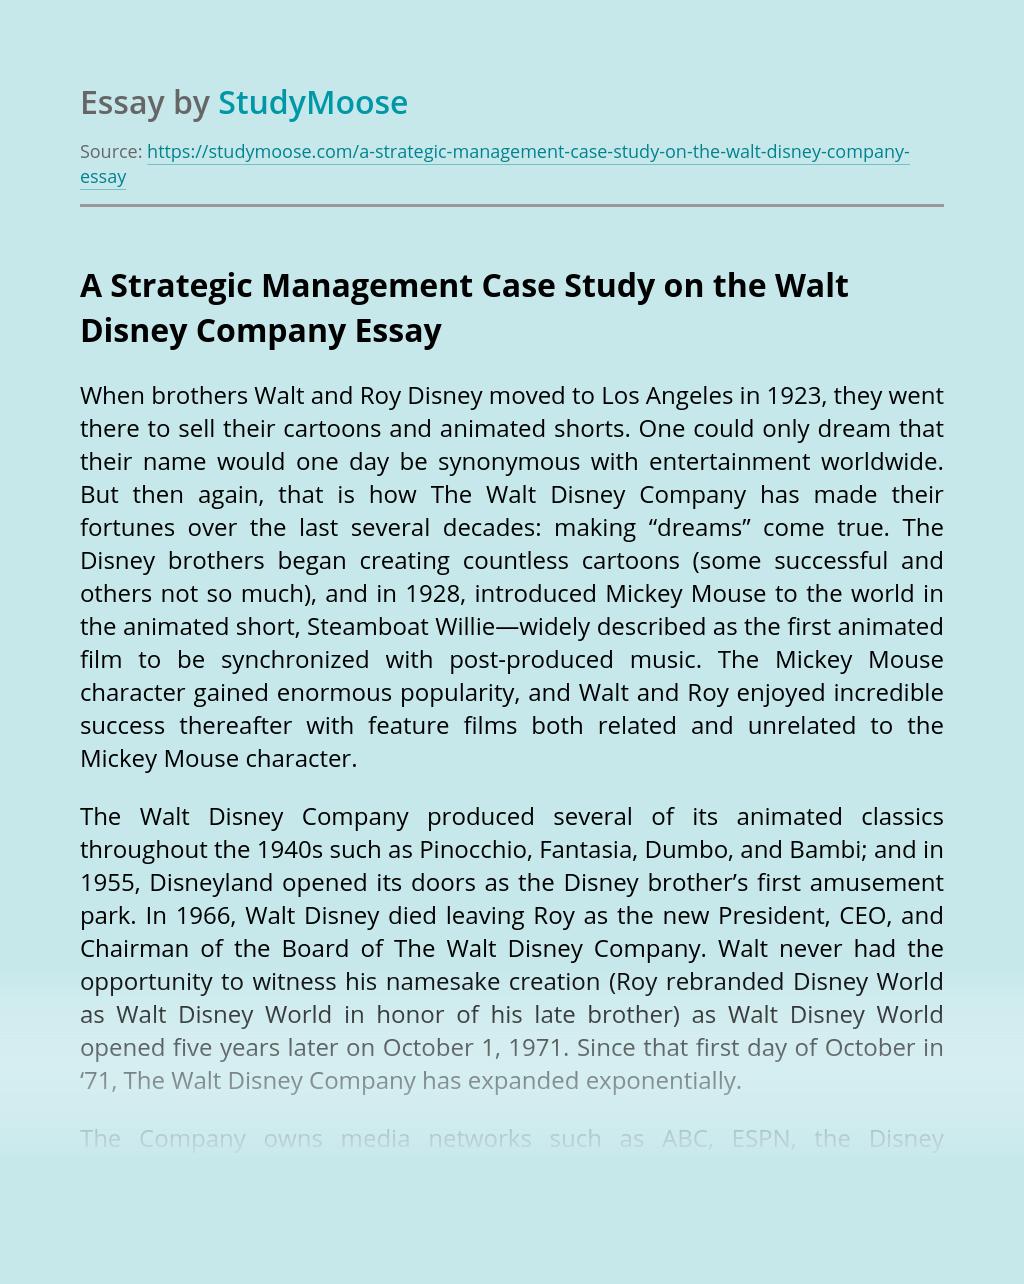 A Strategic Management Case Study on the Walt Disney Company